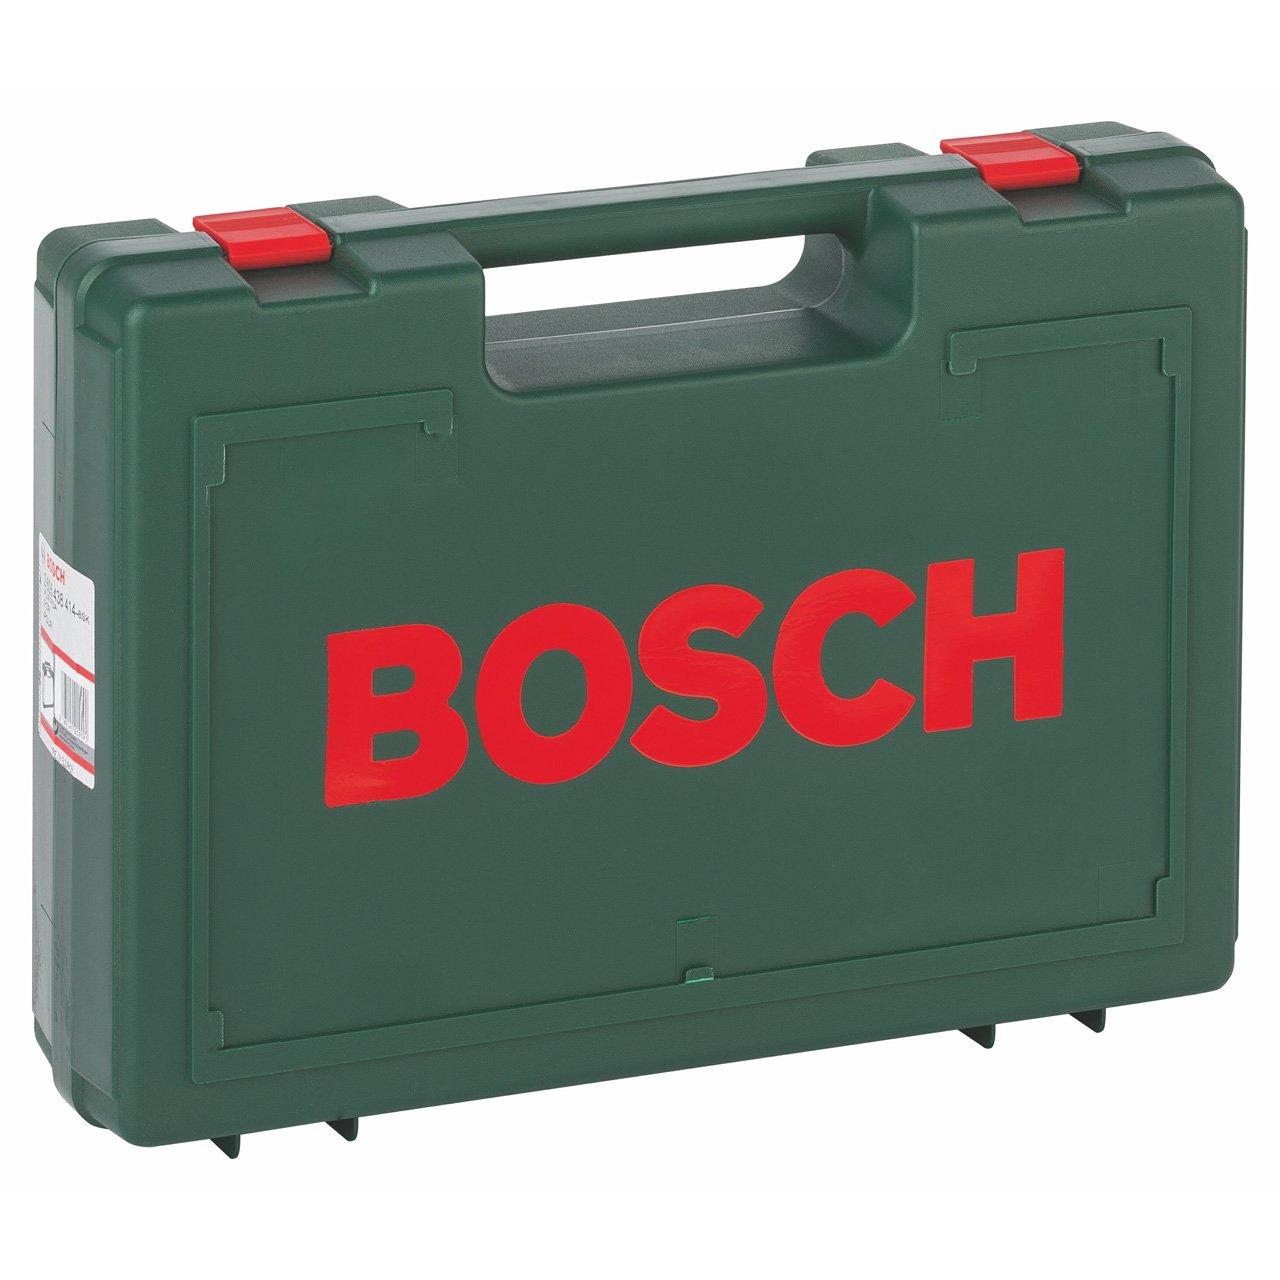 400 X 300 X 150 Bosch  Valise de transport en plastique